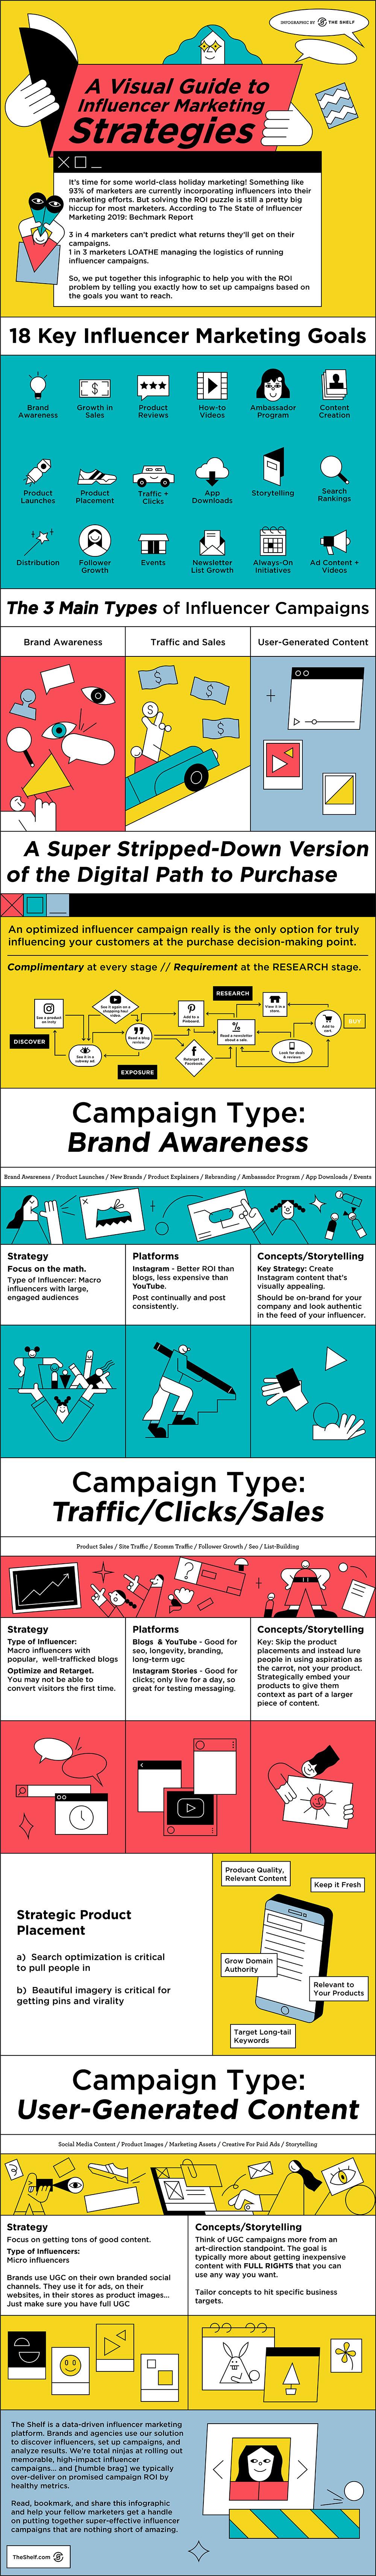 Devising Influencer Marketing Campaigns